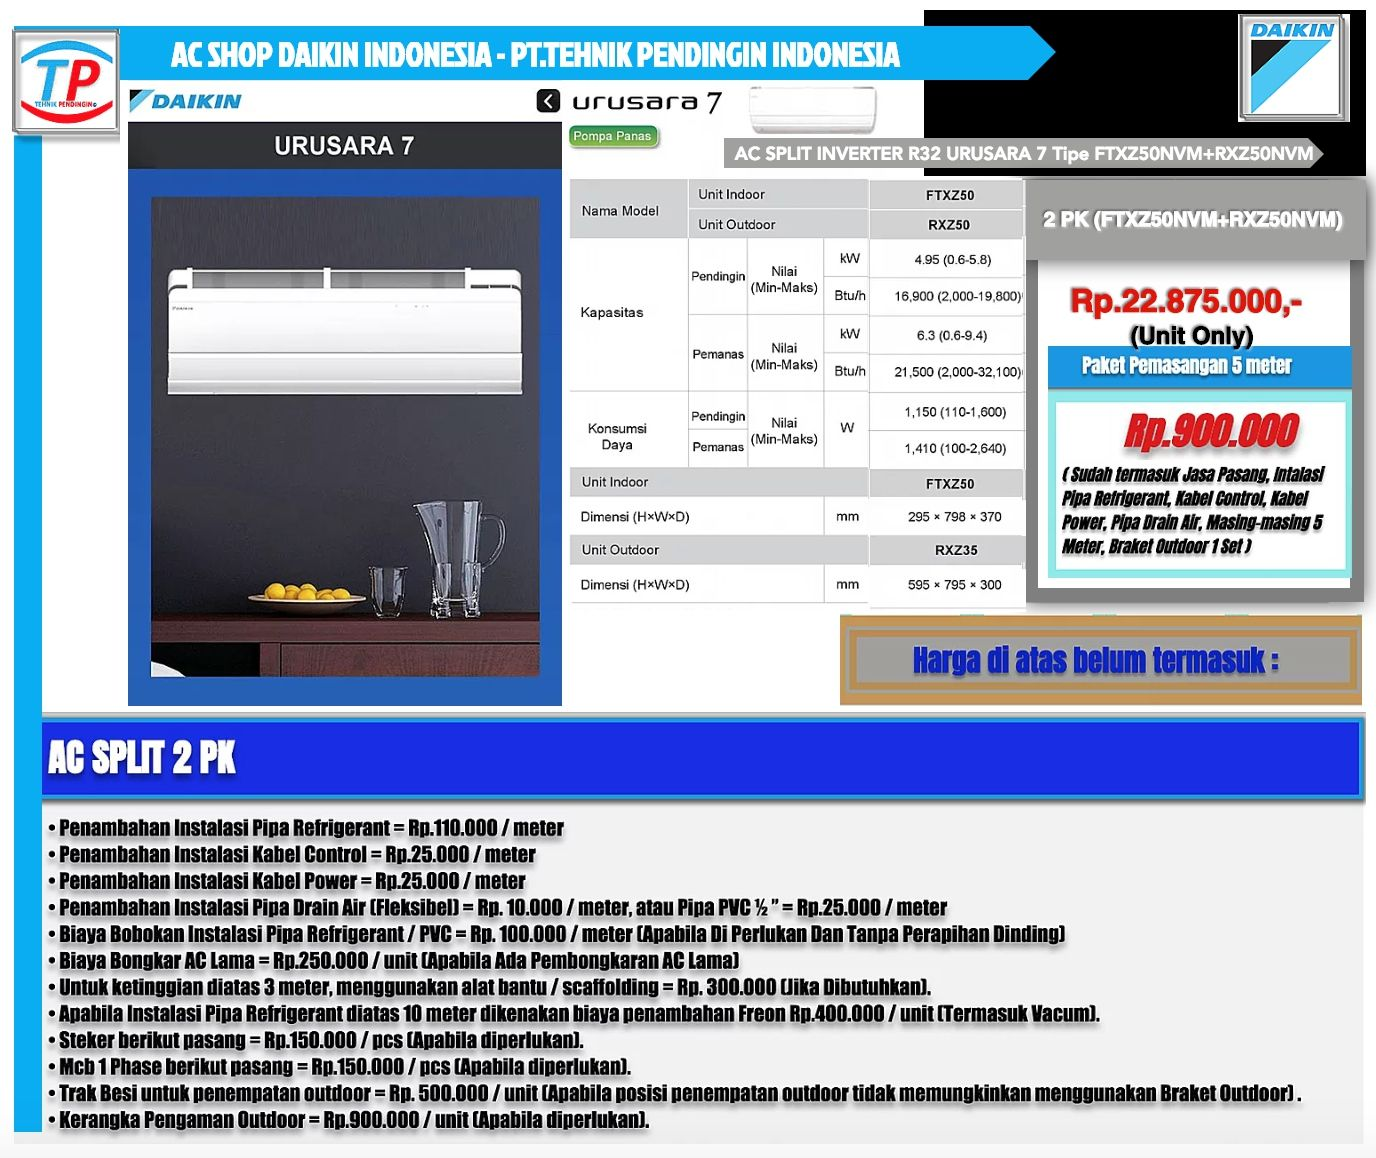 Ac Split Daikin Inverter 2 Pk Urusara 7 R32 Dikin Air Conditioner Universal Teknik Jakarta Timur Split Ac Split Inverter Splits